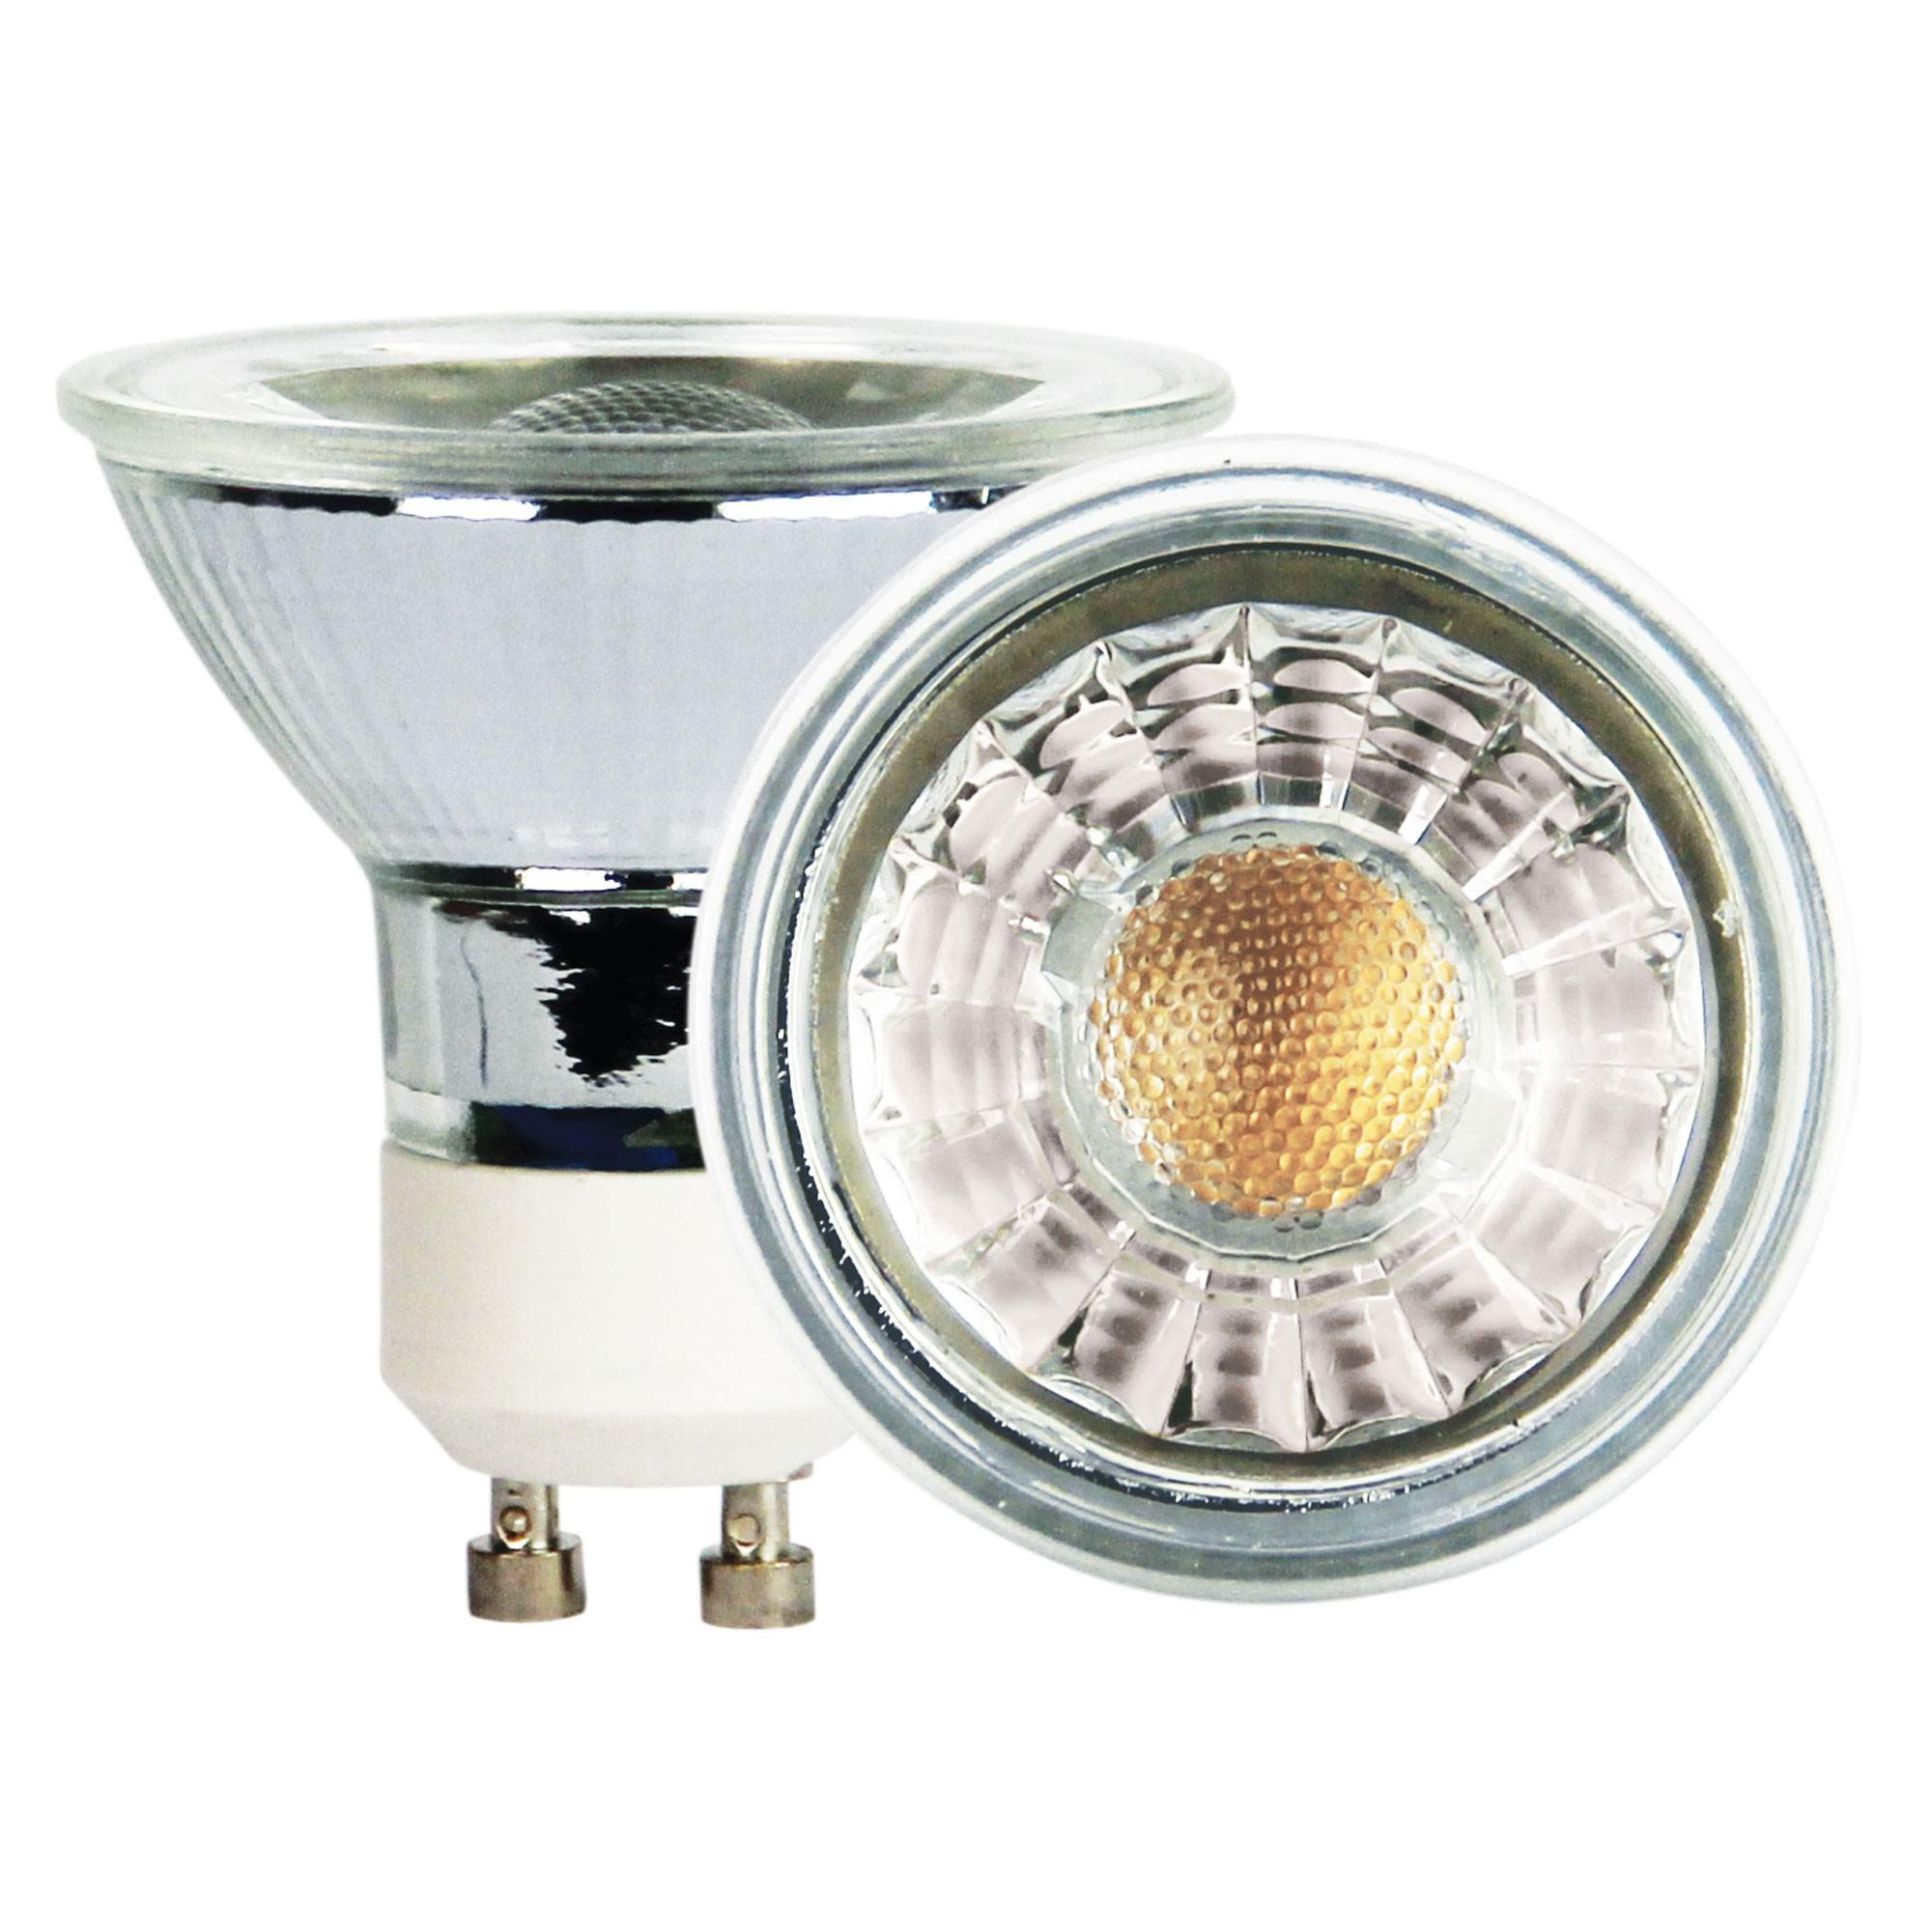 Allume Smart LED Globe, 6W, GU10, 3000K